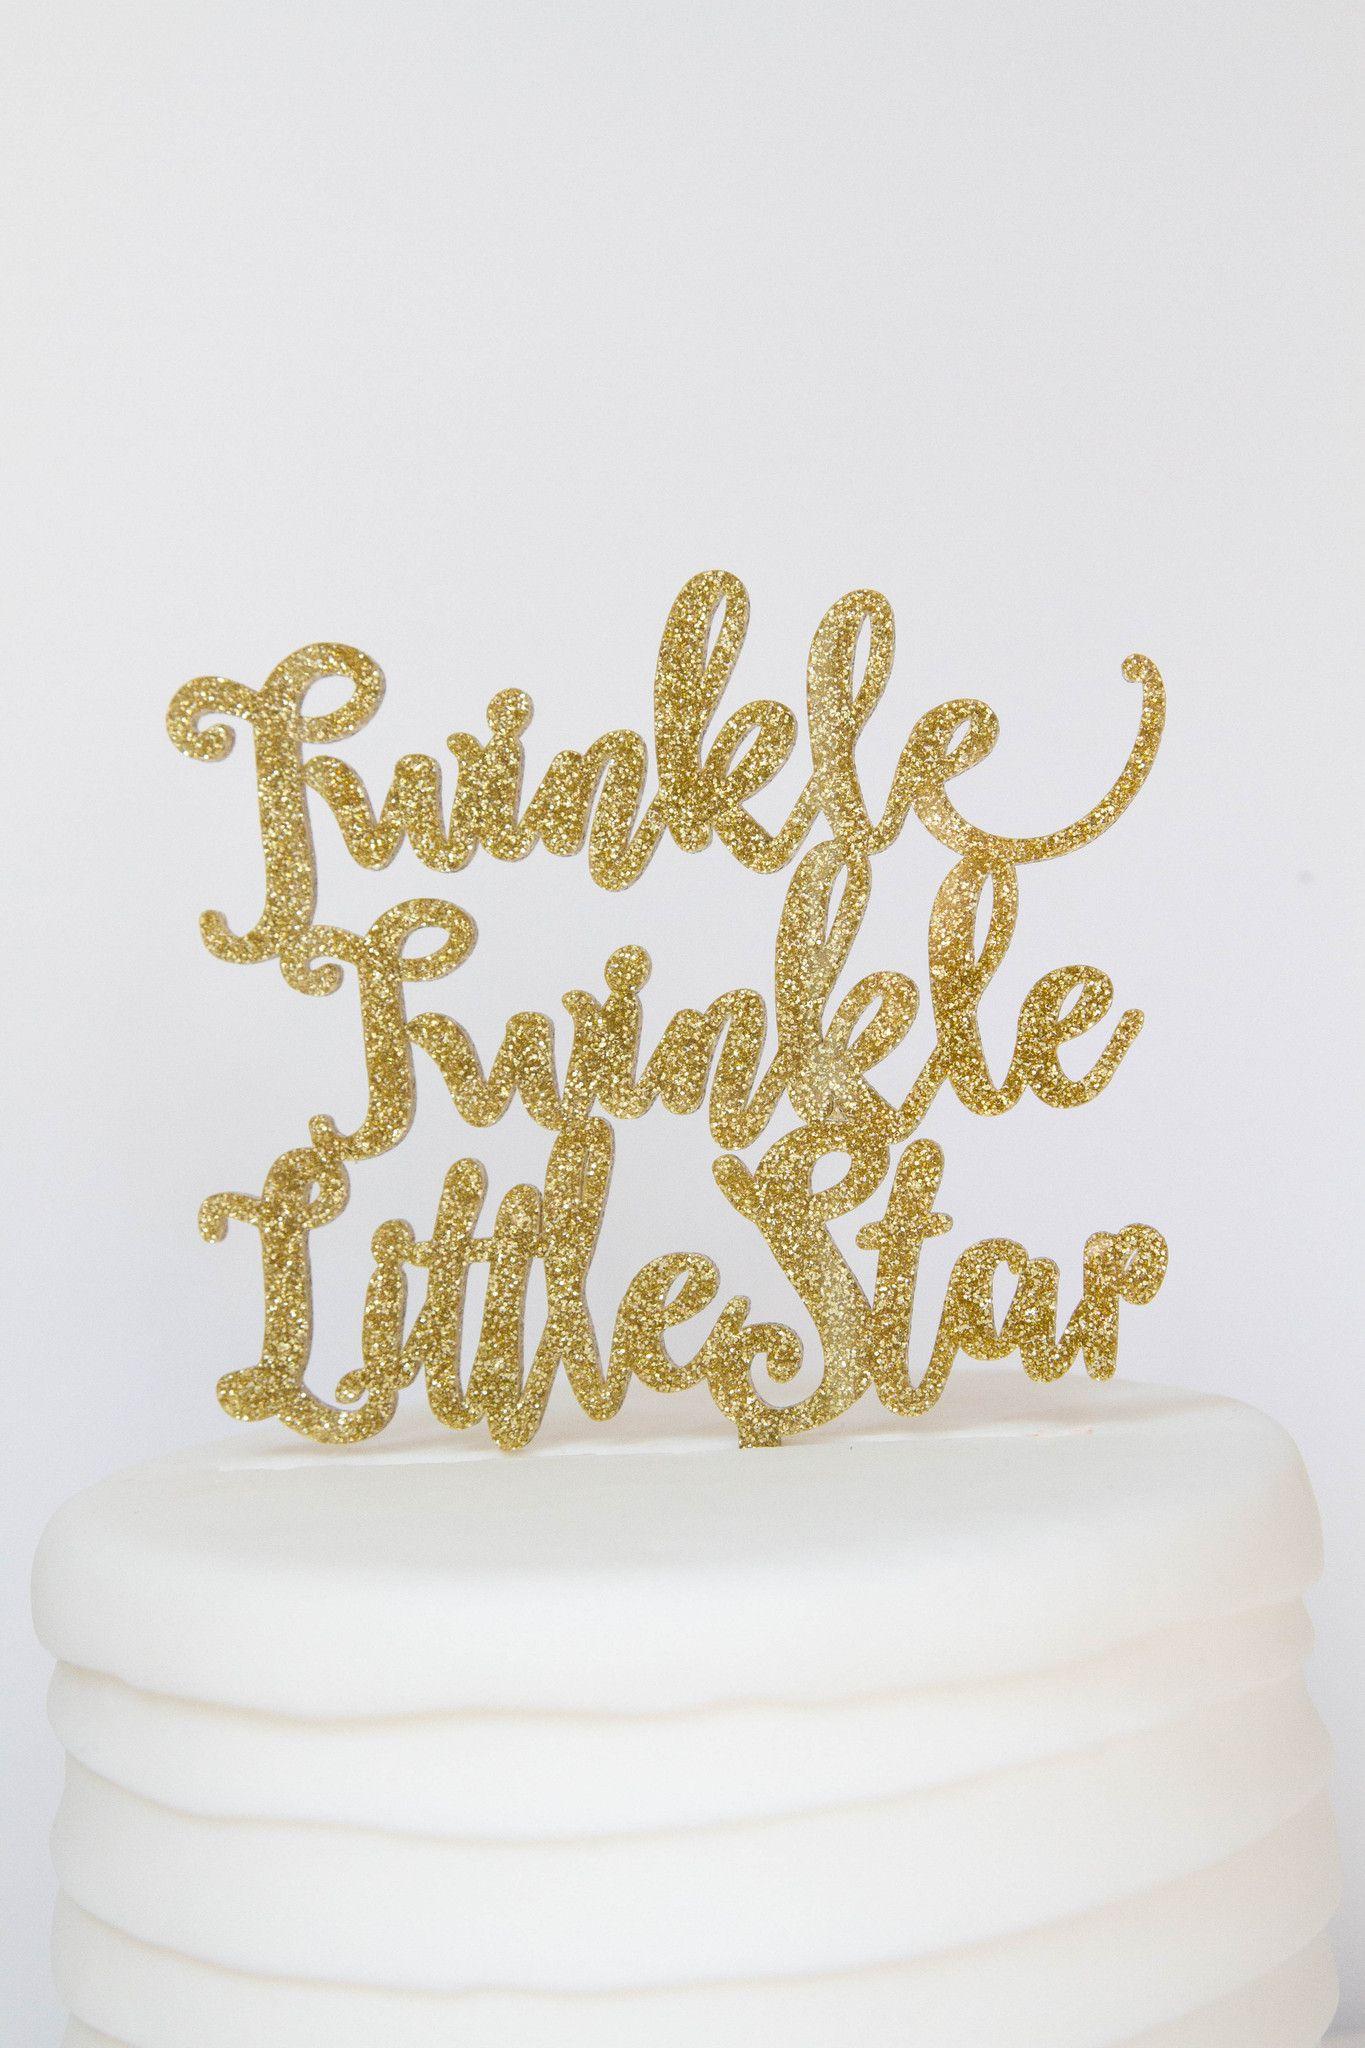 Twinkle Twinkle Little Star Baby Shower 1st Birthday Cake Topper